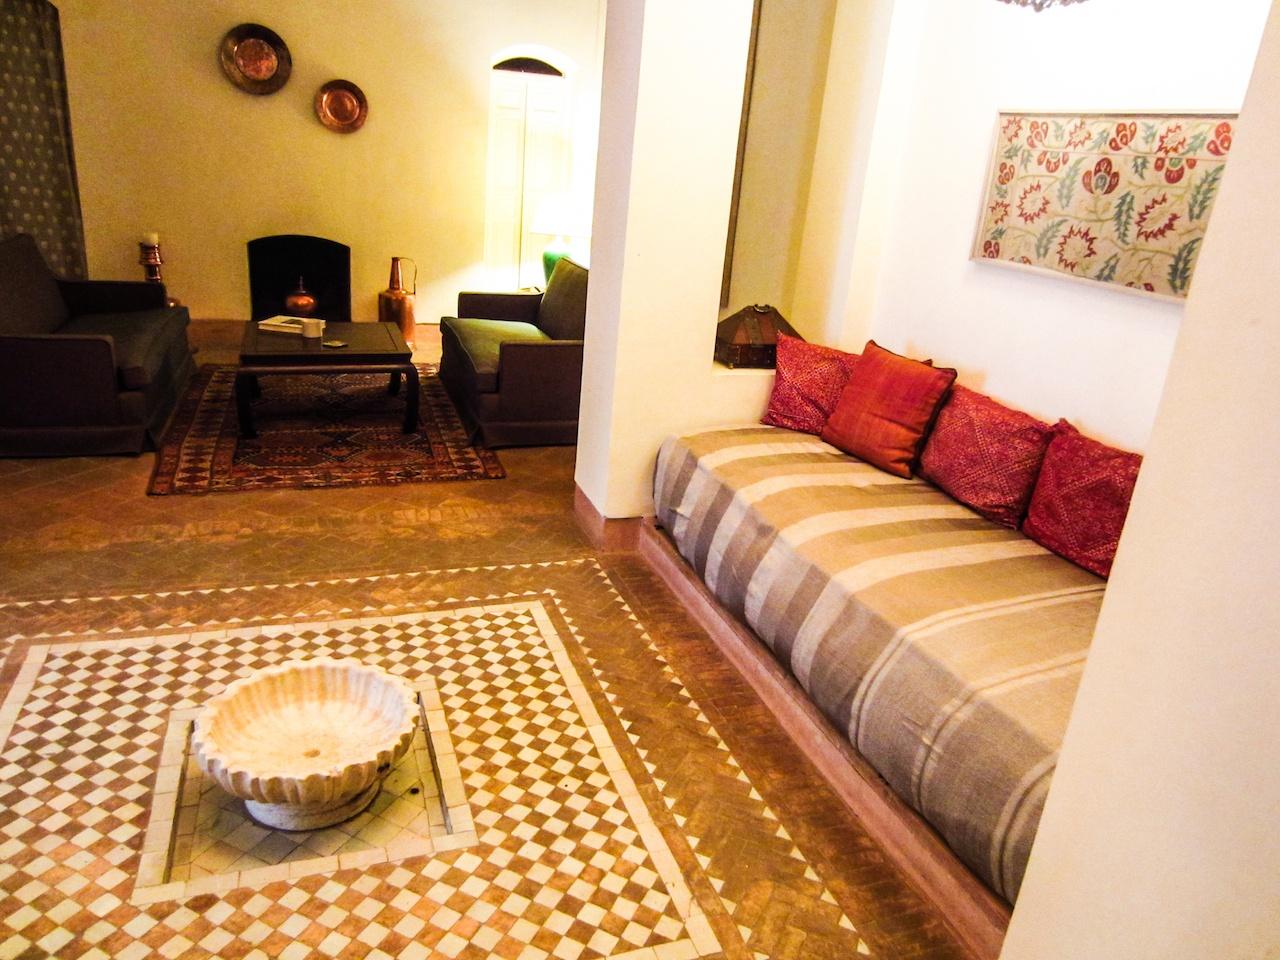 http://www.riyadelcadi.com/wp-content/uploads/2015/11/Suite-Ottomane-Living-Room-©-Paula-Sweet-e1448365883230.jpg